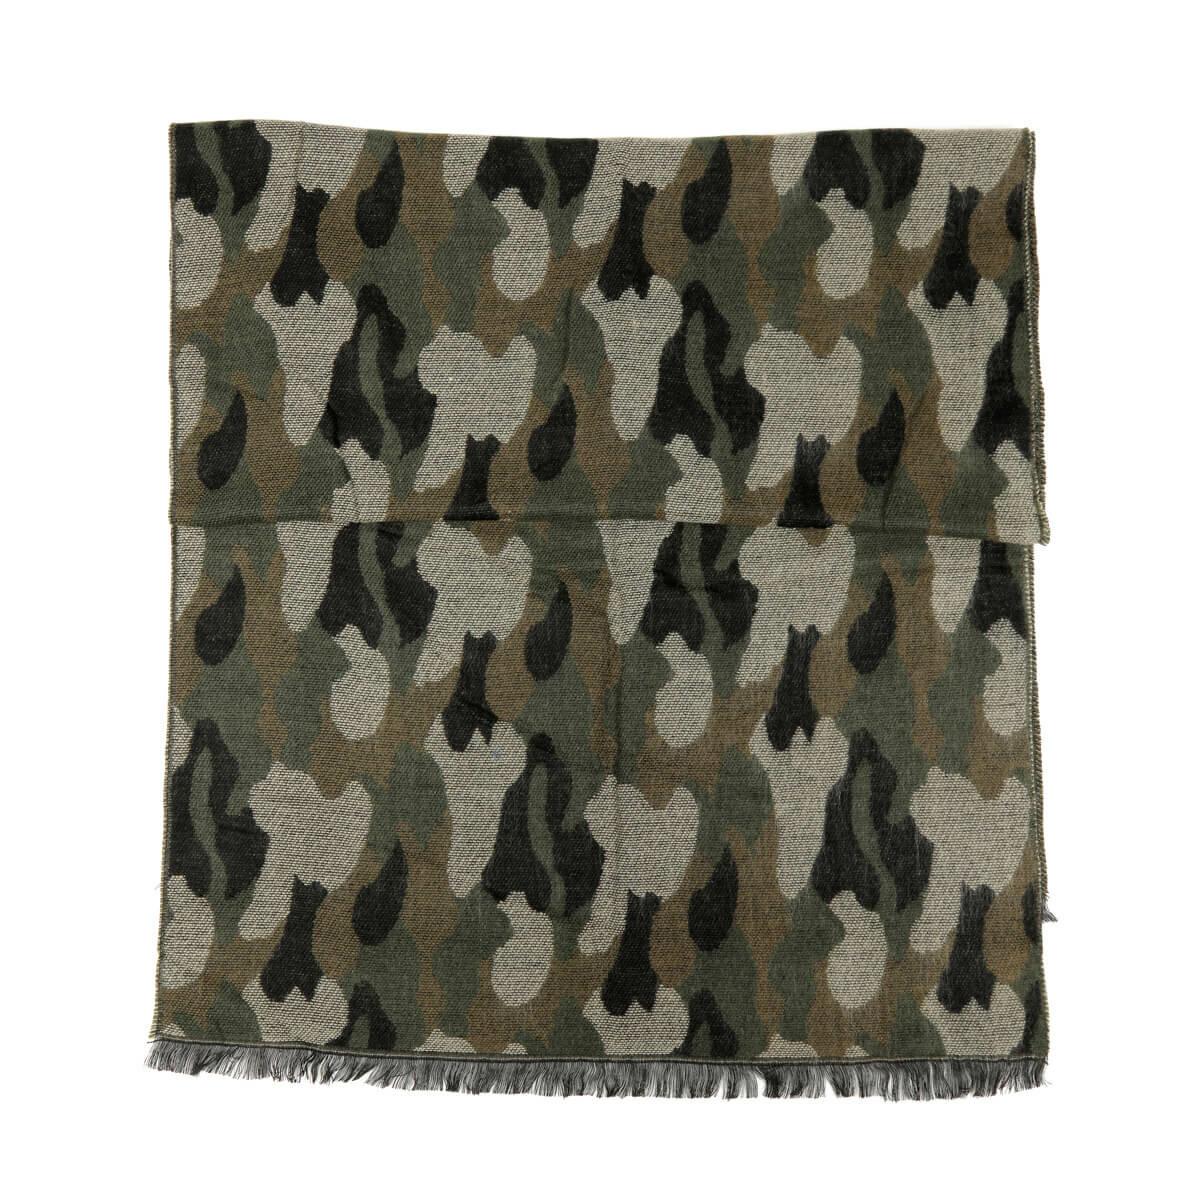 FLO SAL 10870 56Z Khaki Women 'S Shawl BUTIGO